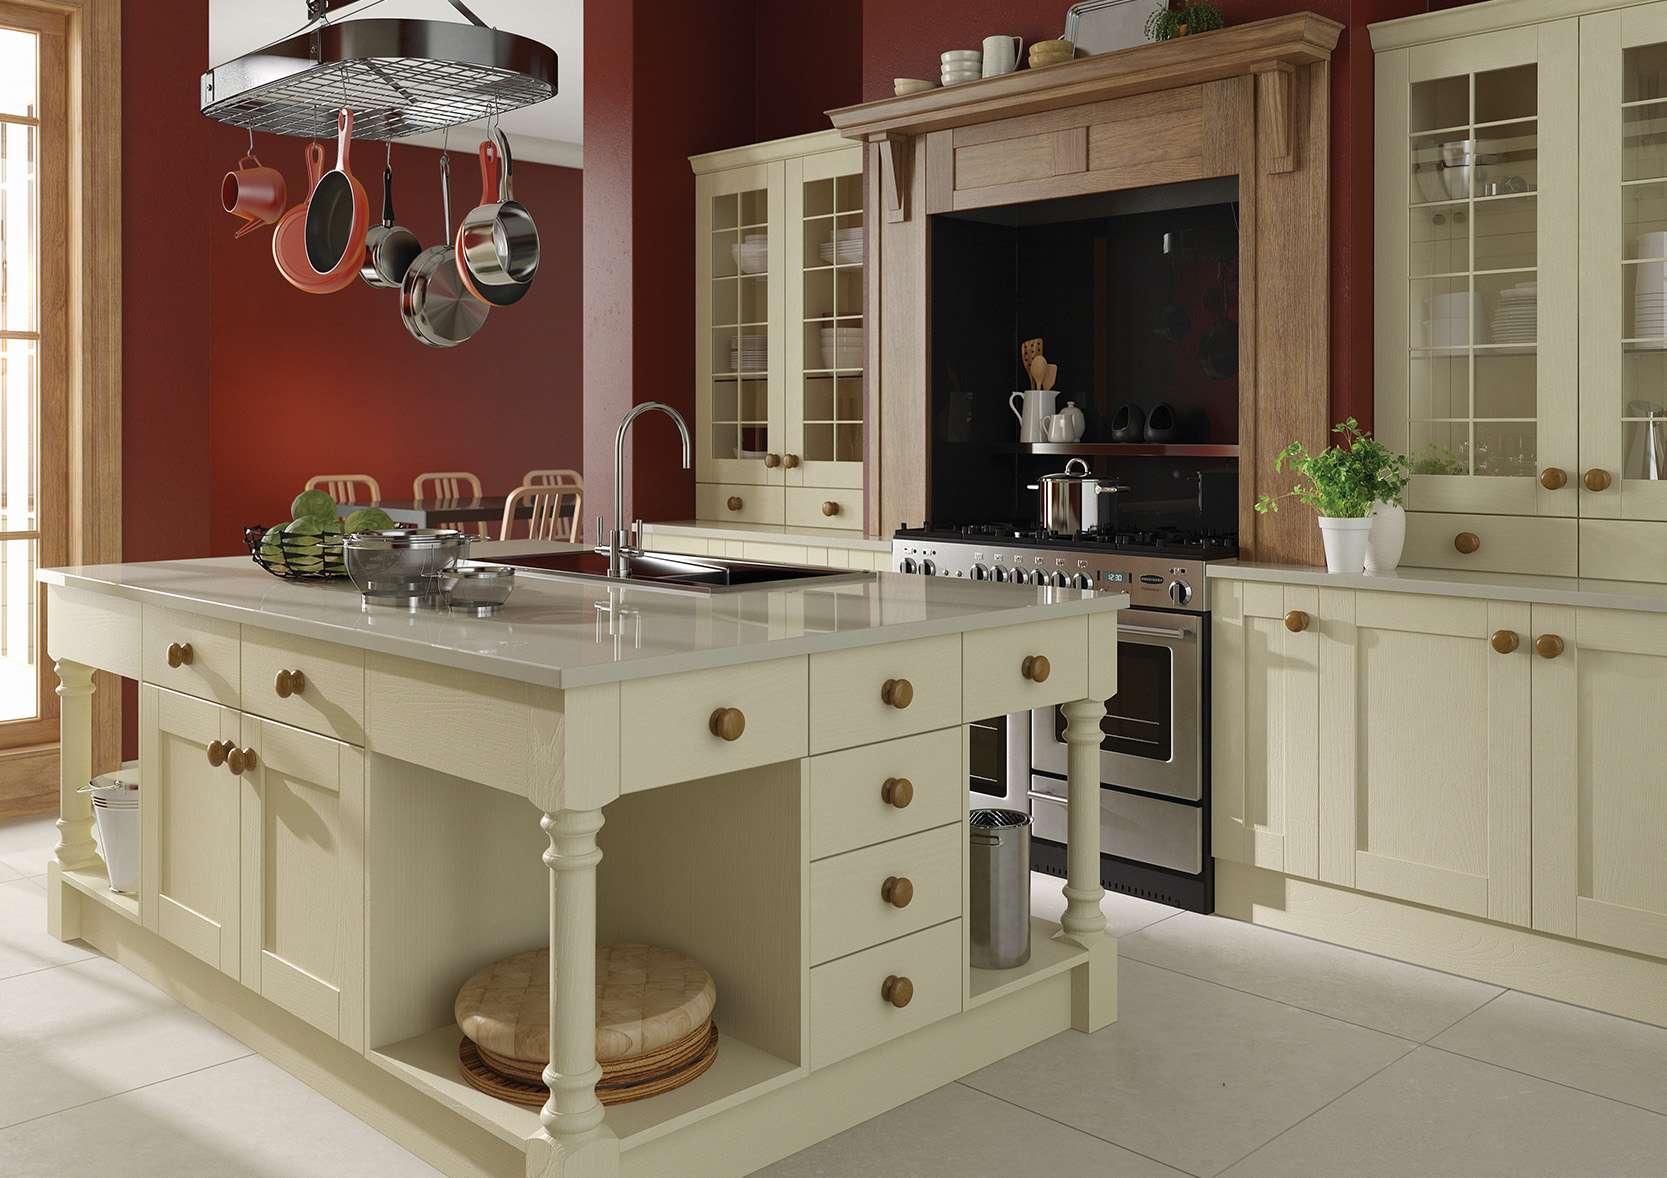 Kitchens Sale Cheap Kitchen Units Doors Cabinets